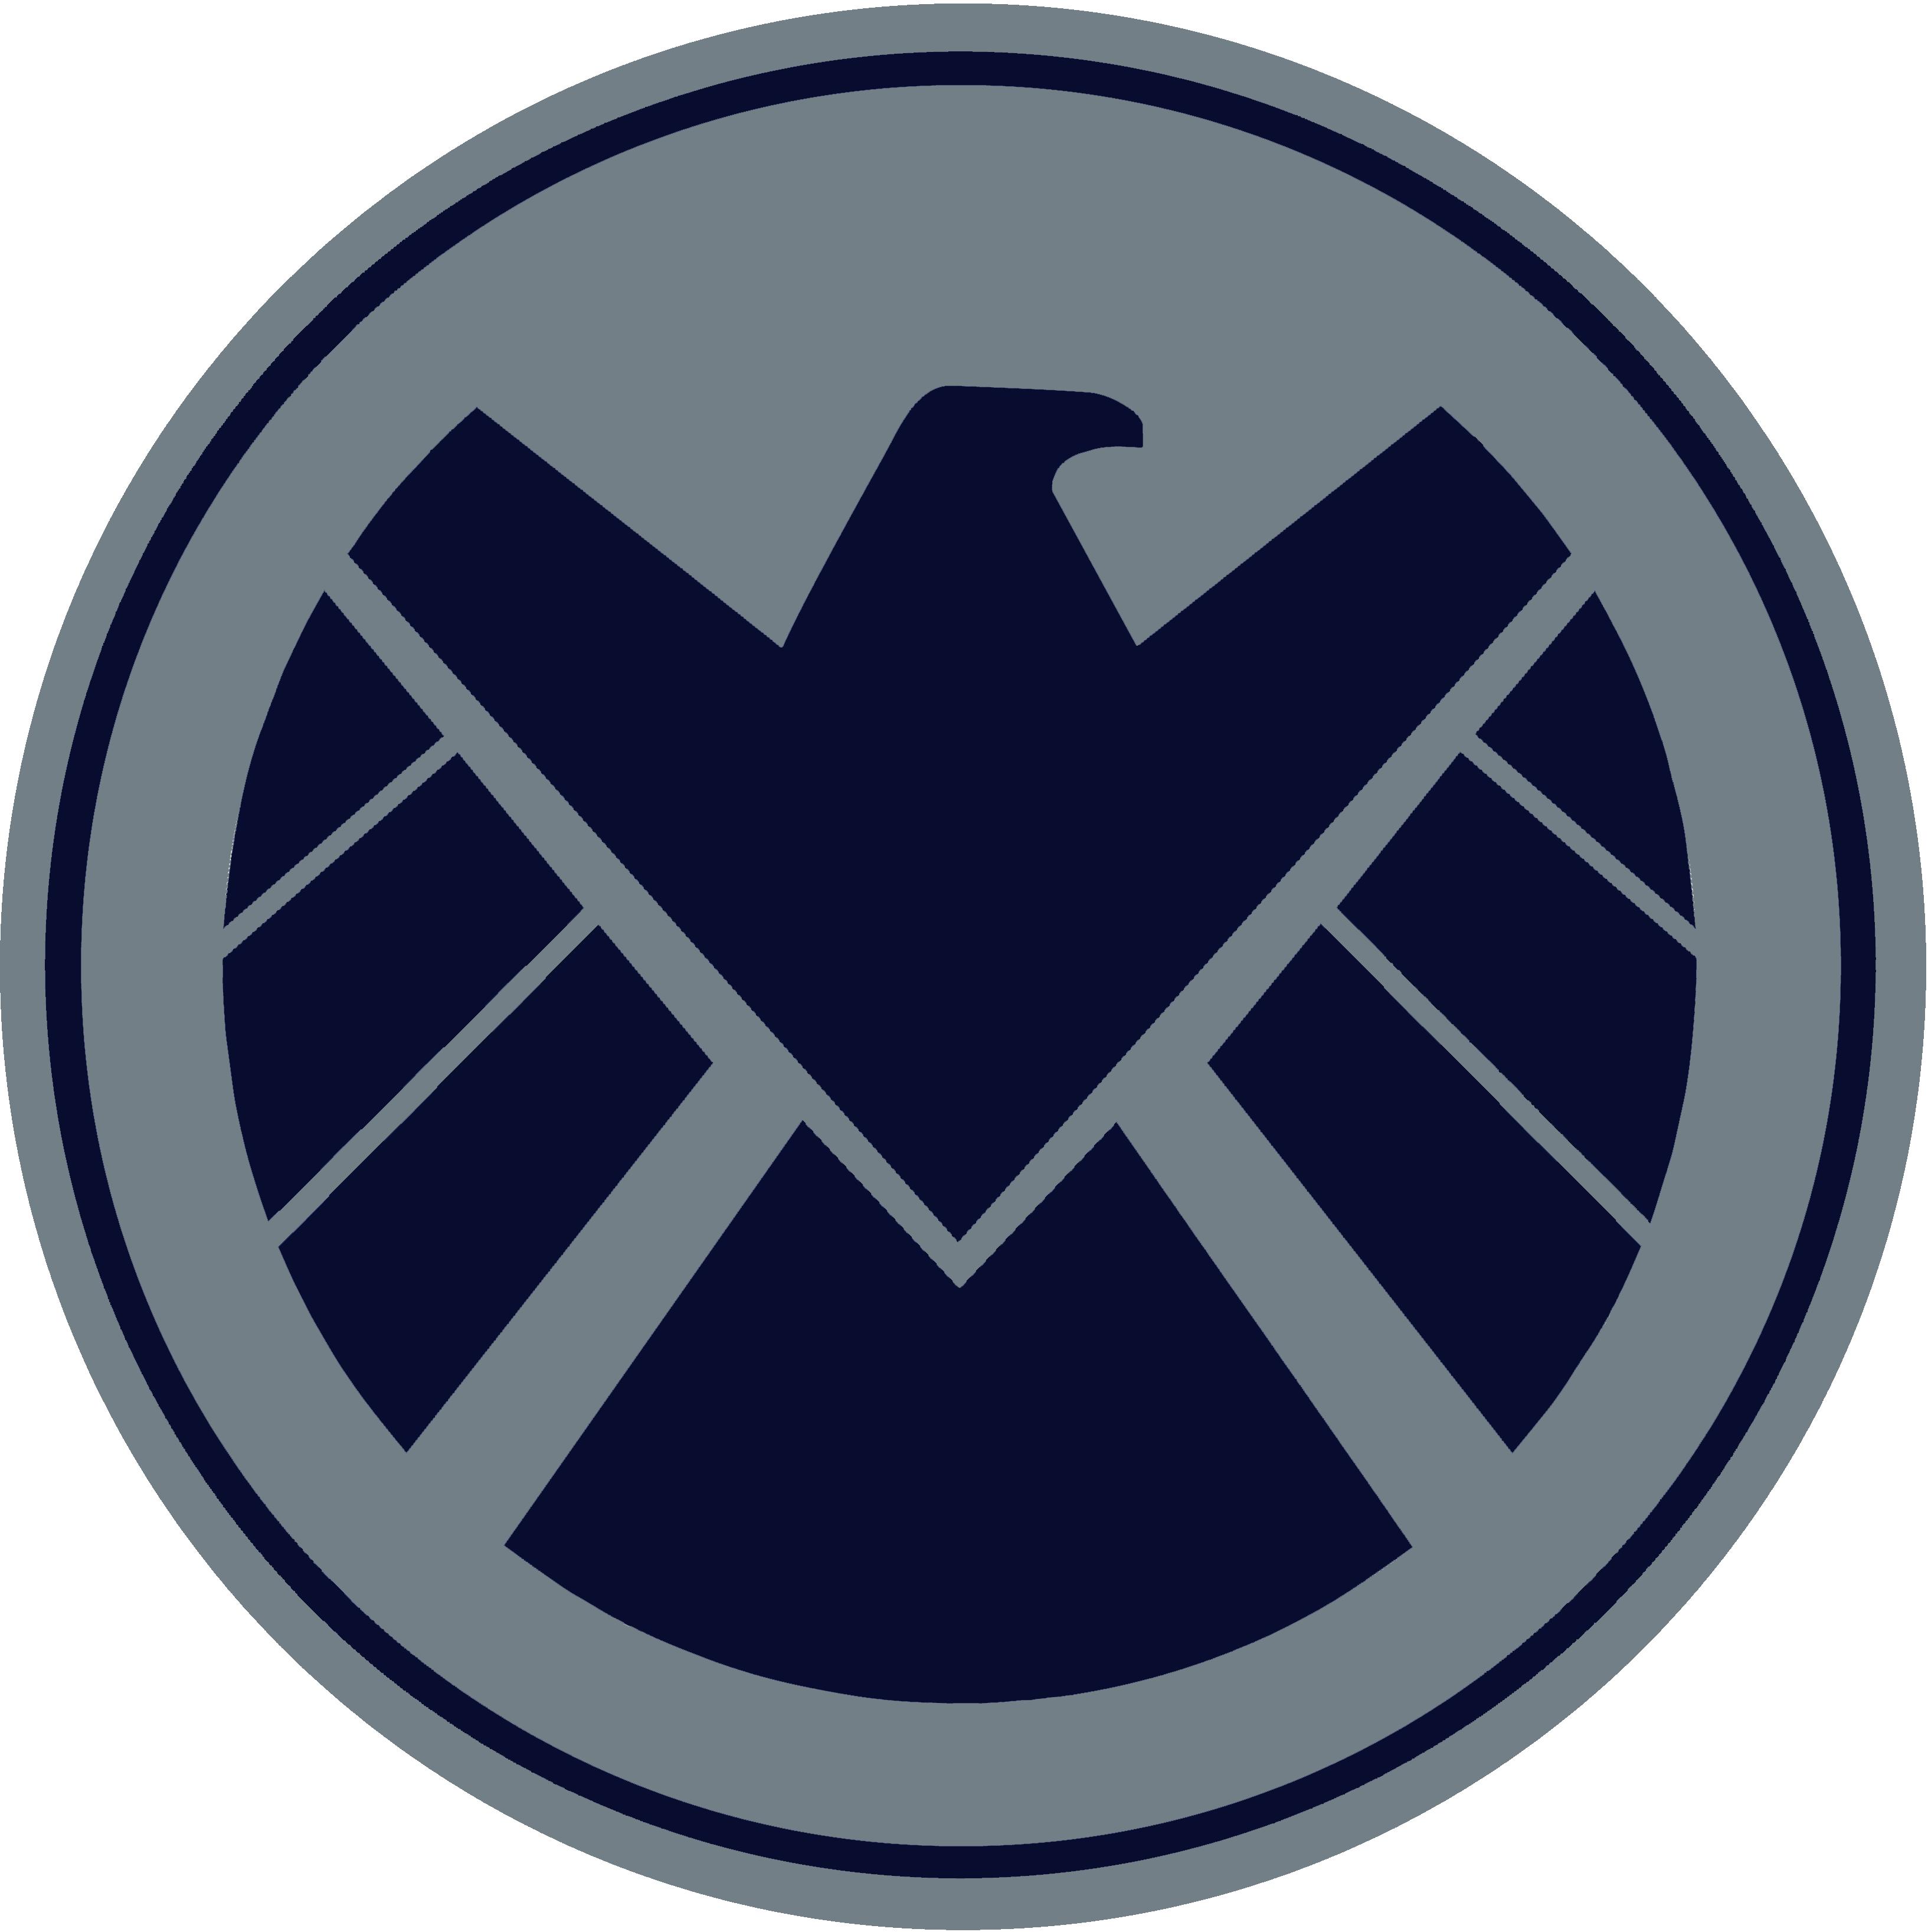 Shield Logo Related Keywords & Suggestions - Shield Logo Long Tail ...